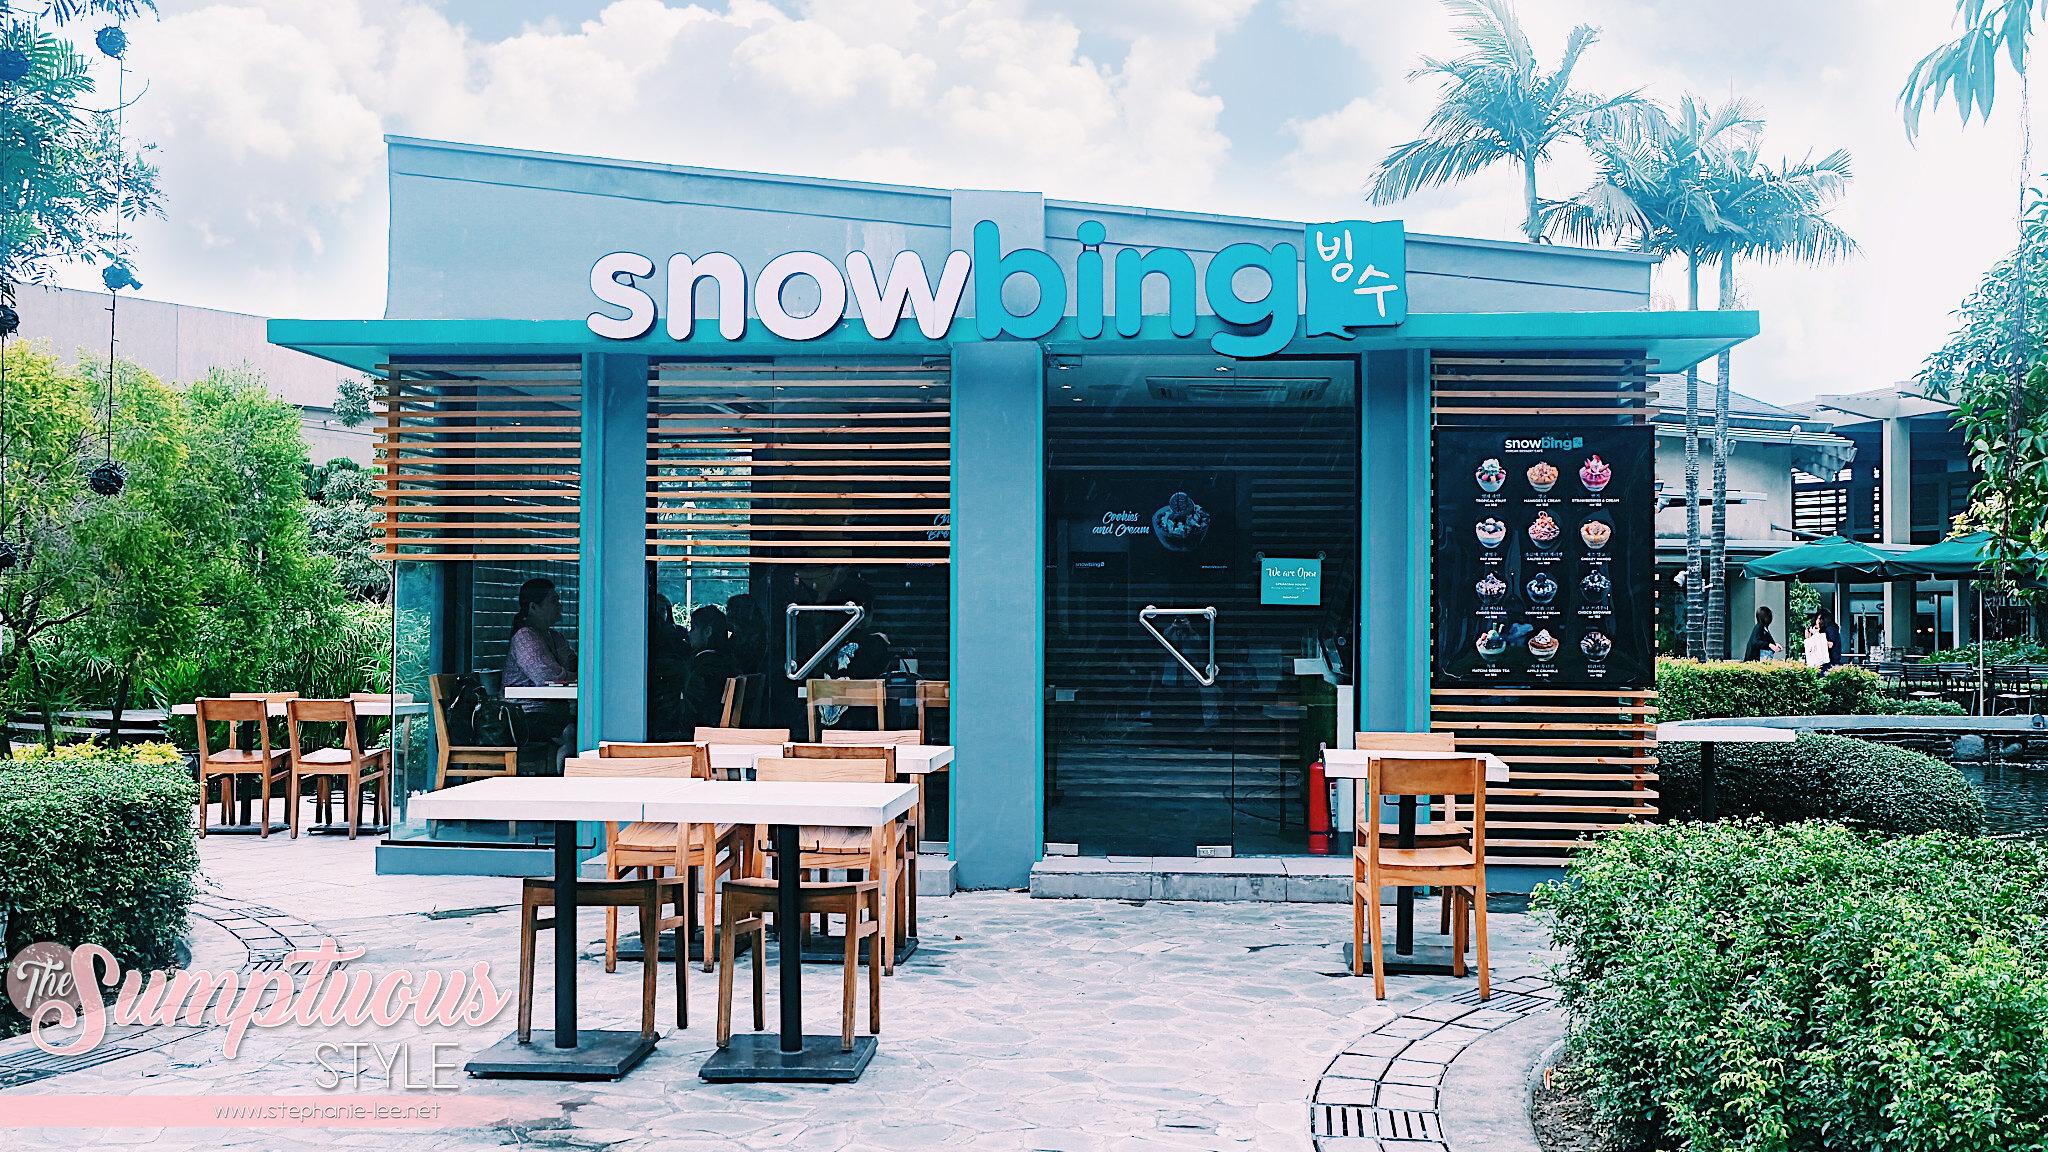 Snowbing